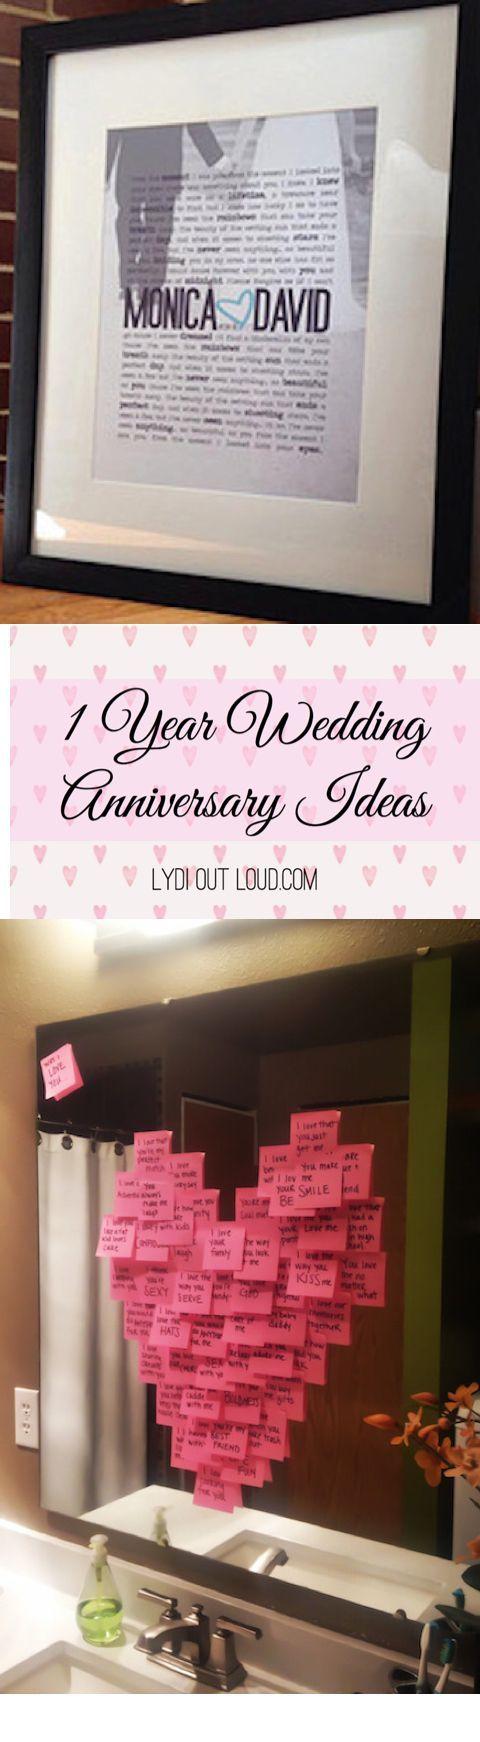 1 Year Wedding Anniversary Ideas Paper Gift Paper Gifts Anniversary First Wedding Anniversary Gift 1 Year Anniversary Gifts